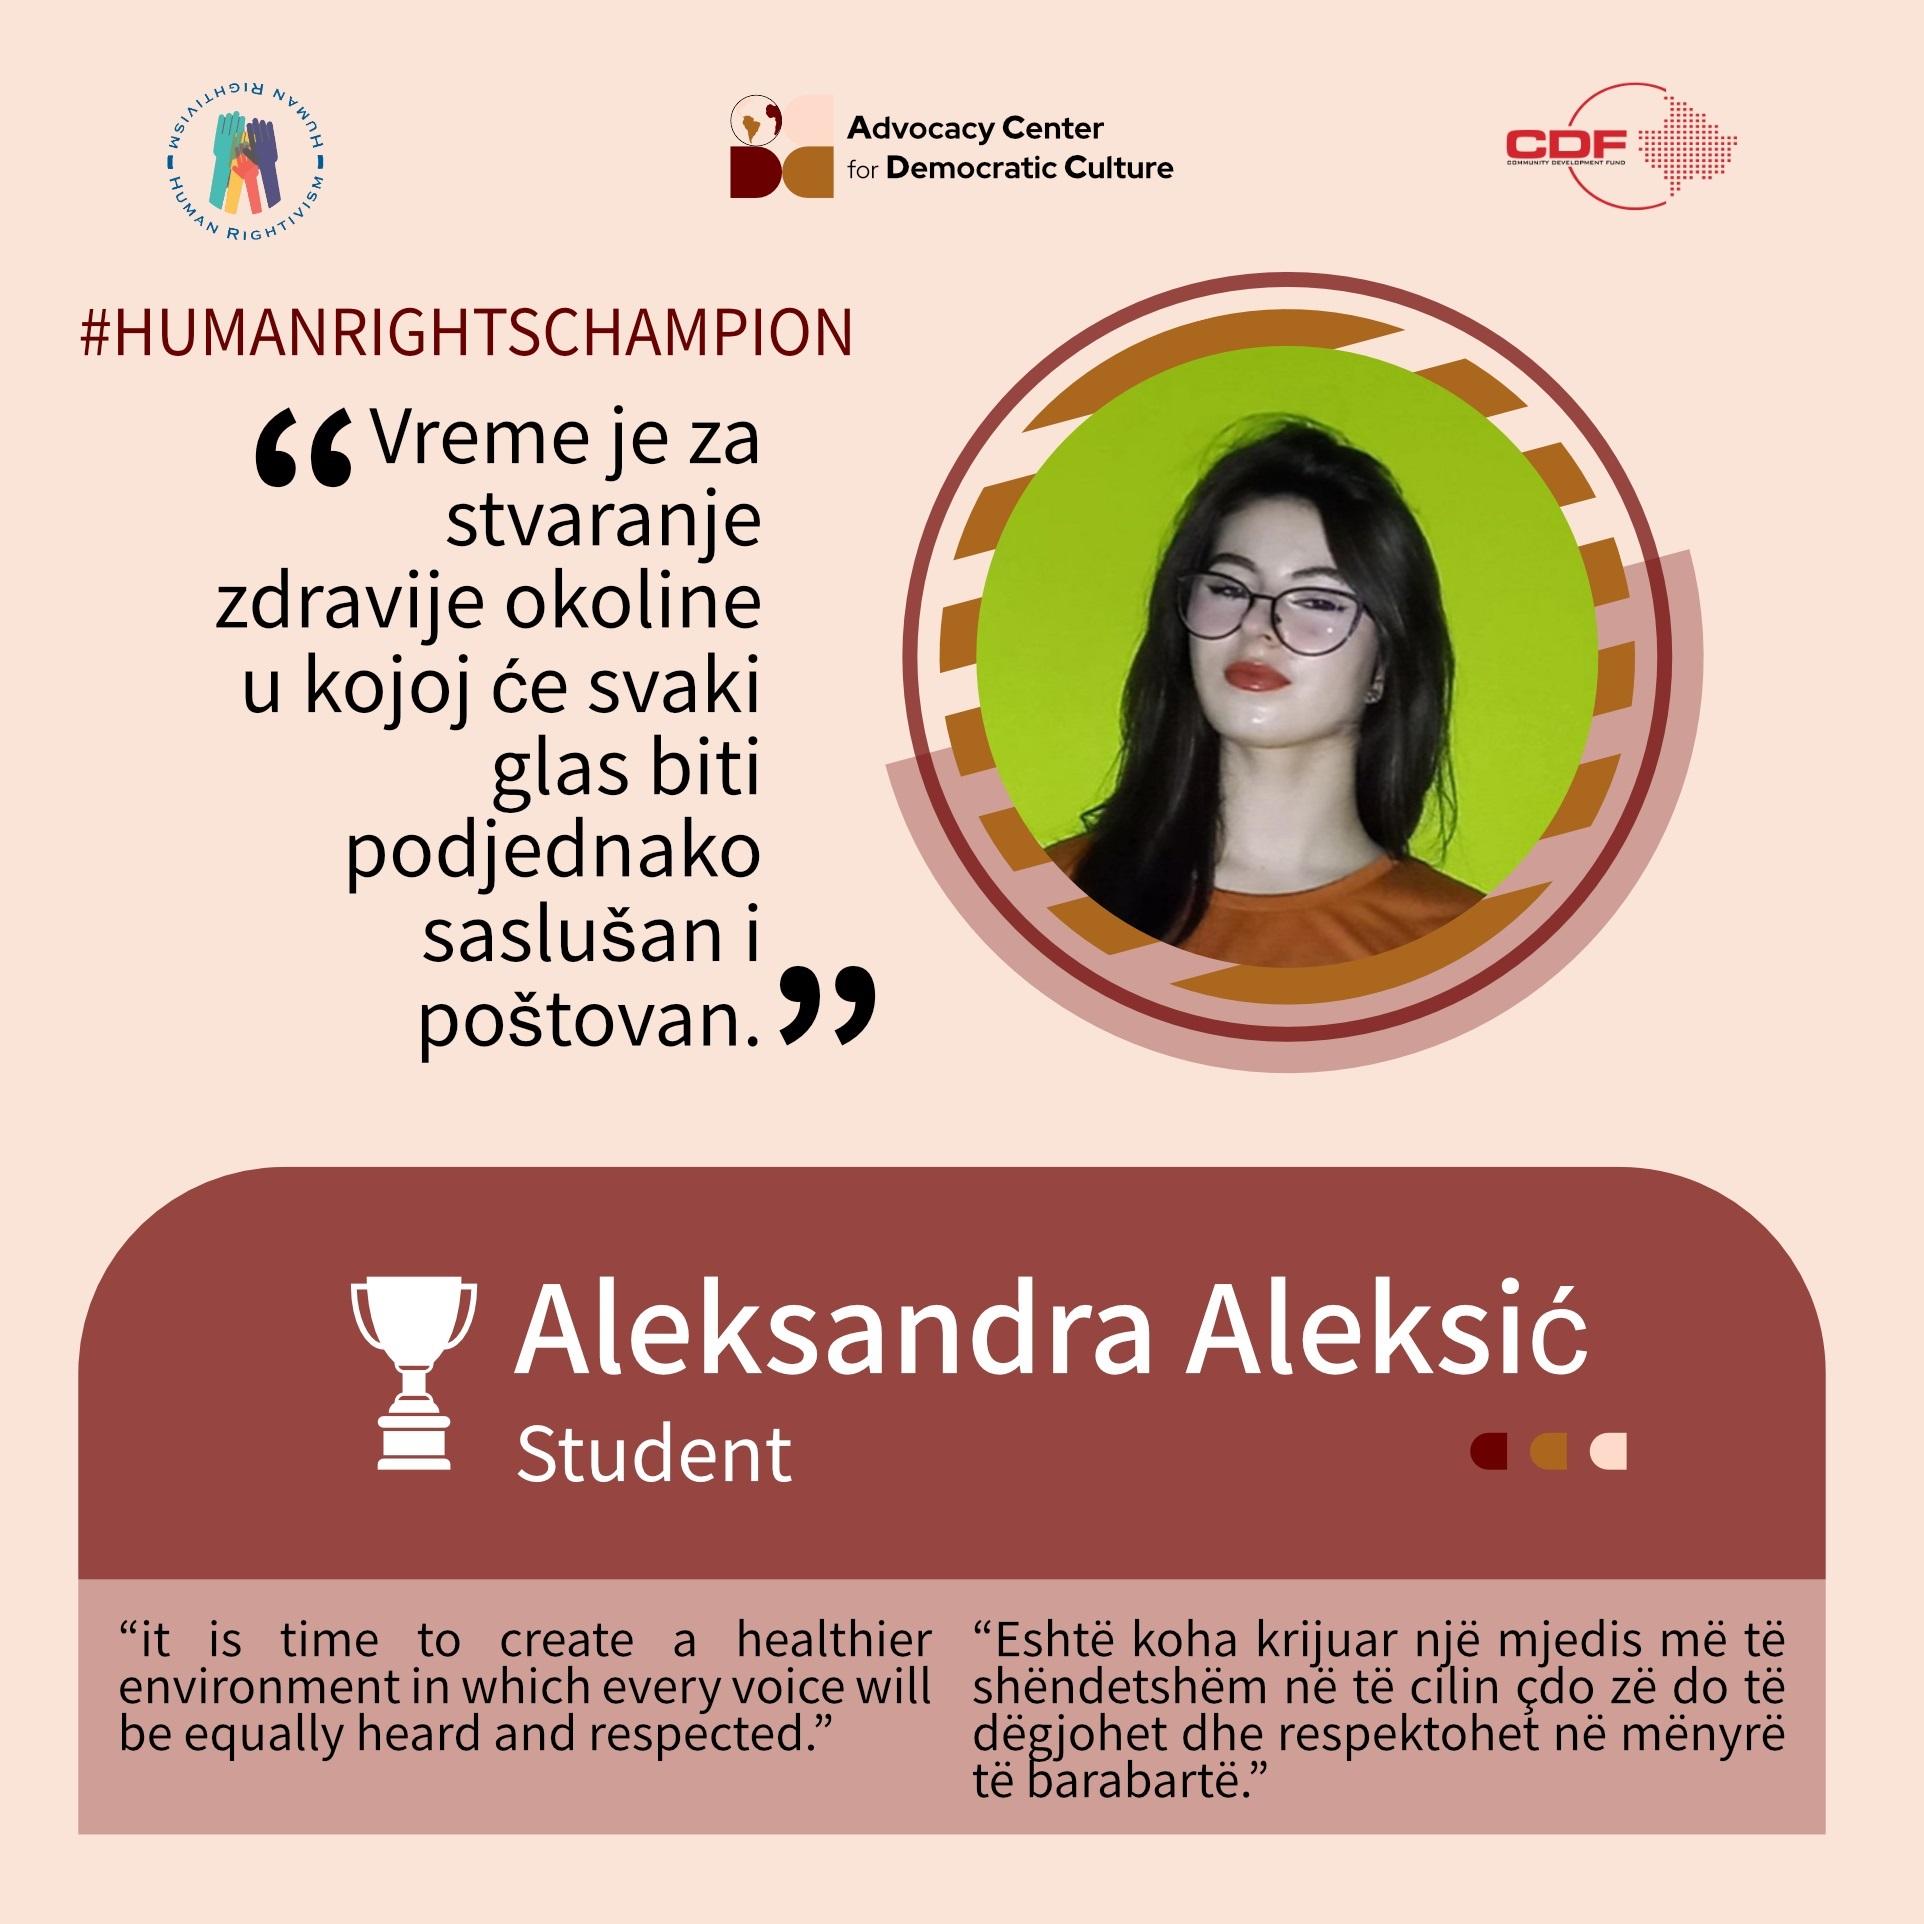 the-human-rights-campaign-humanrightschampion-aleksandra-aleksic